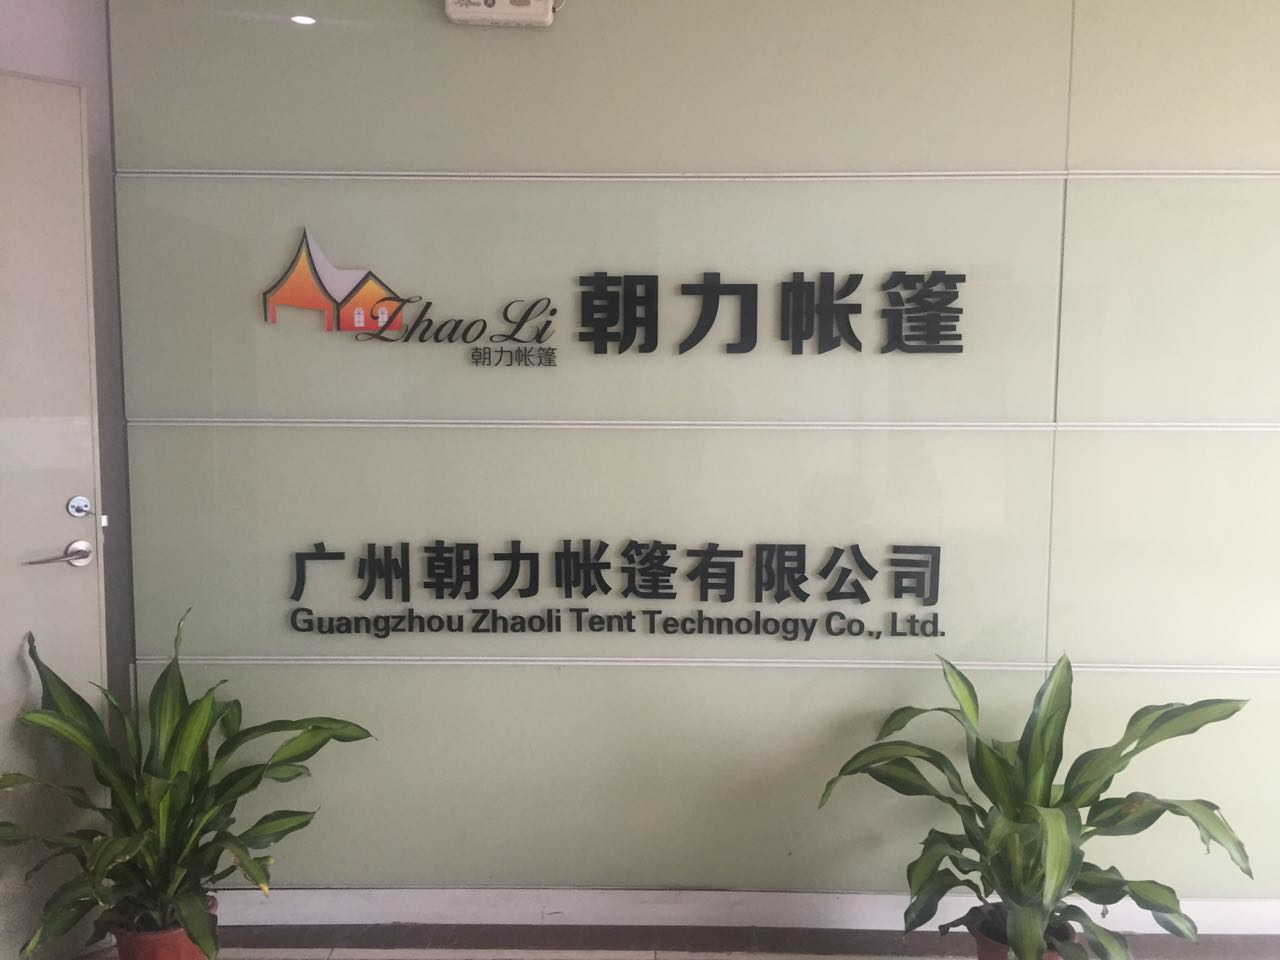 Company Overview - Guangzhou Zhaoli Tent Technology Co., Ltd.